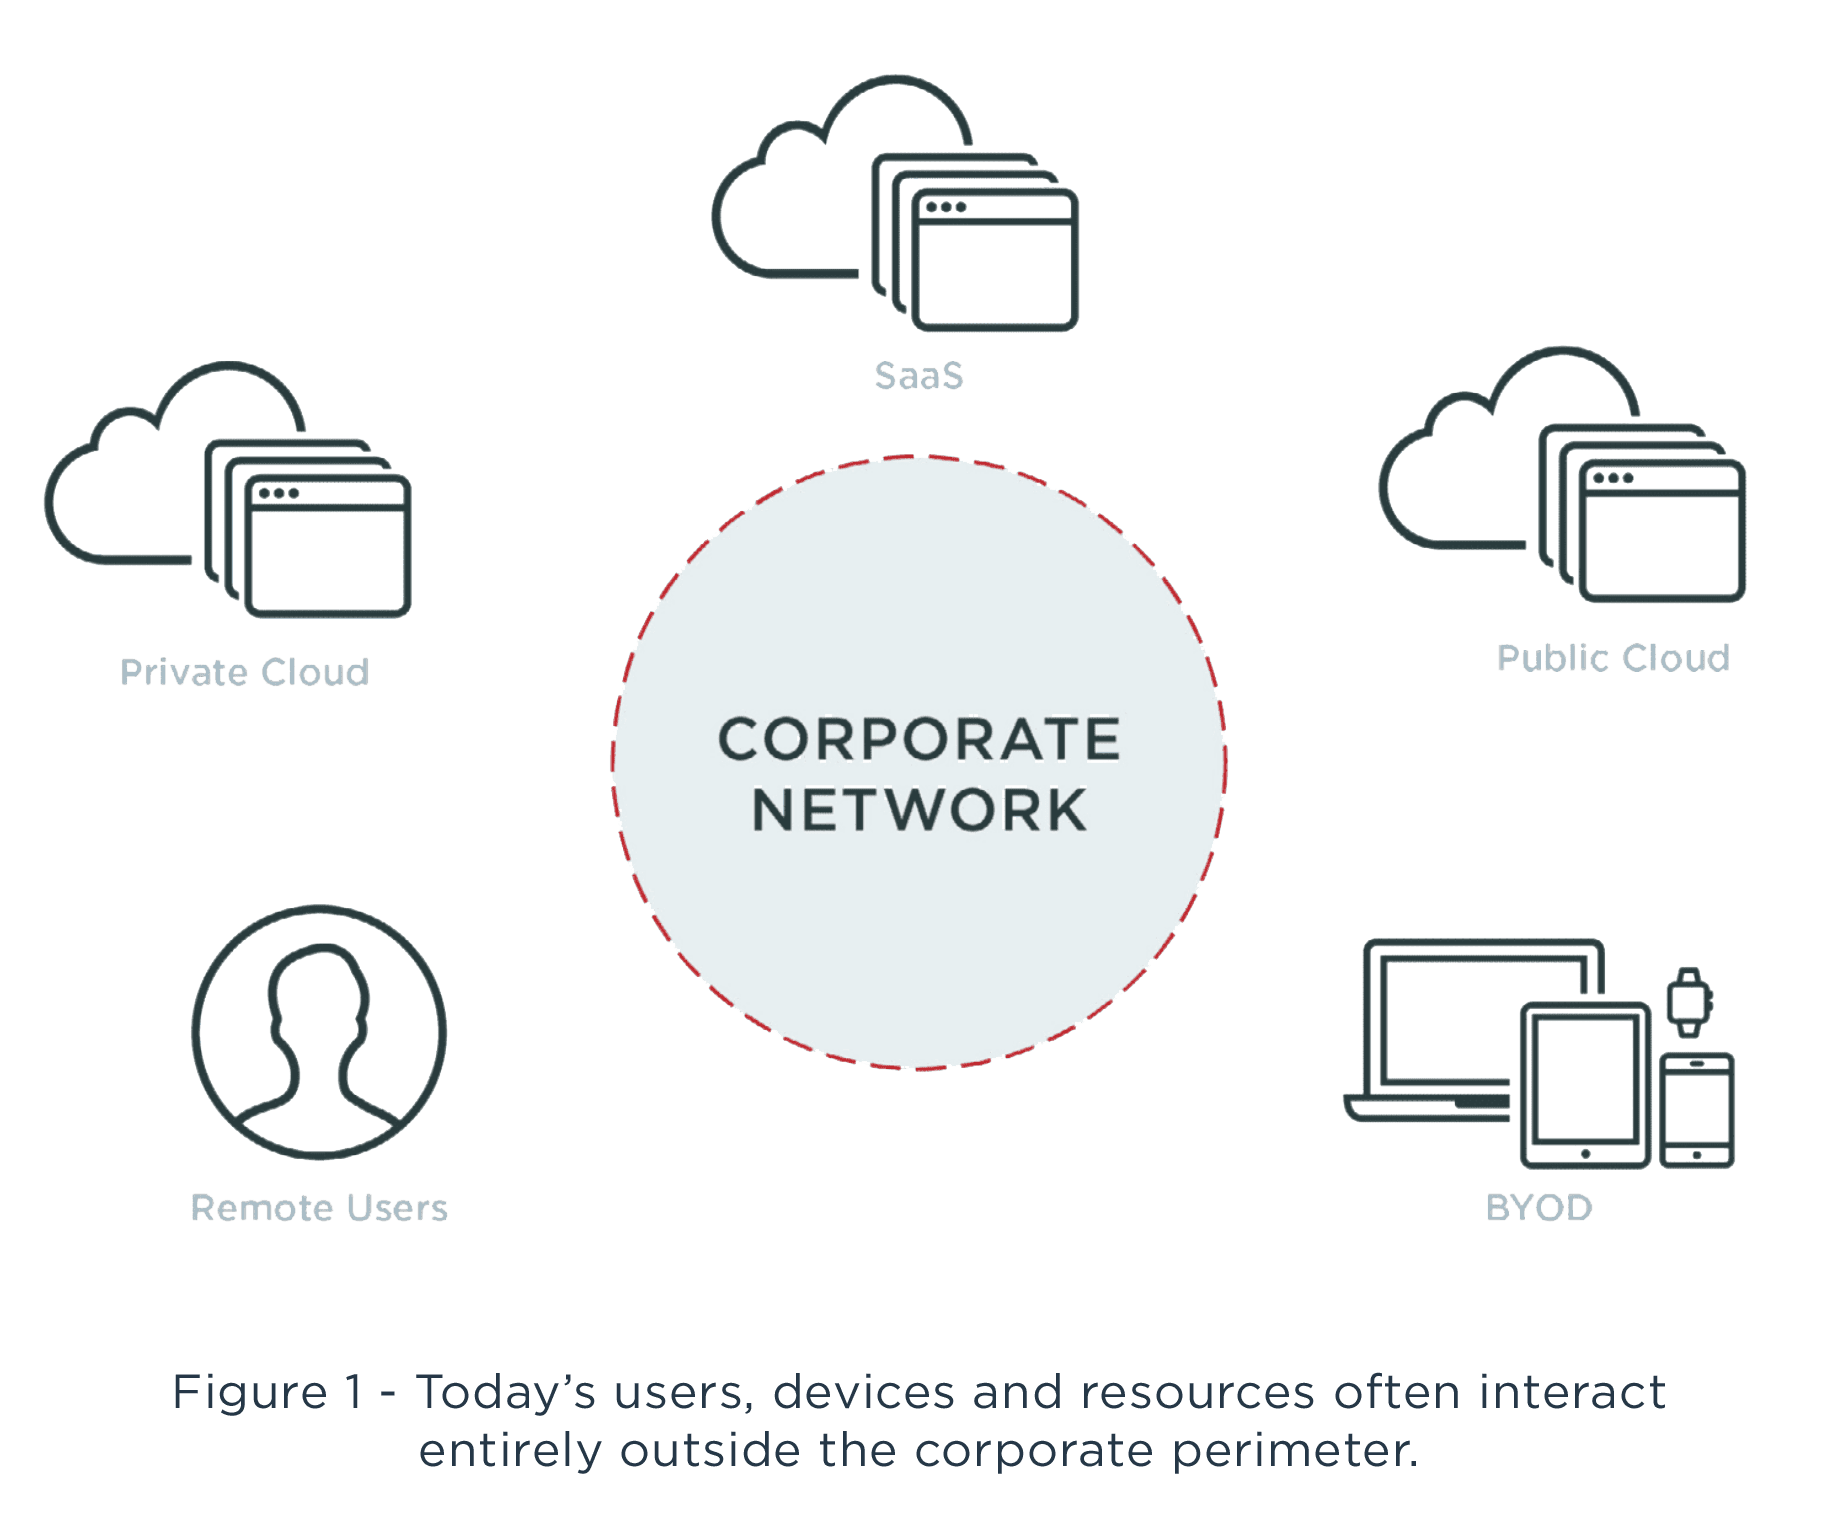 corporate network